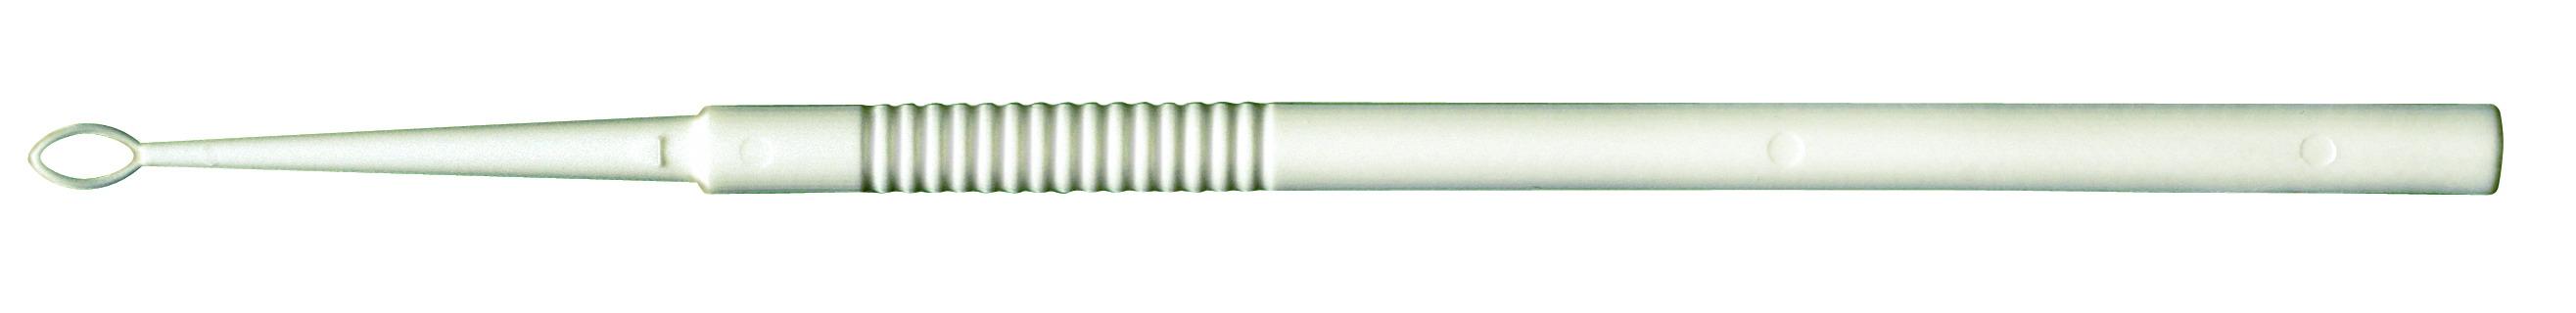 miltex-disposable-ear-curette-loop-tip-quantity-50-to-a-dispener-box-19-321-miltex.jpg